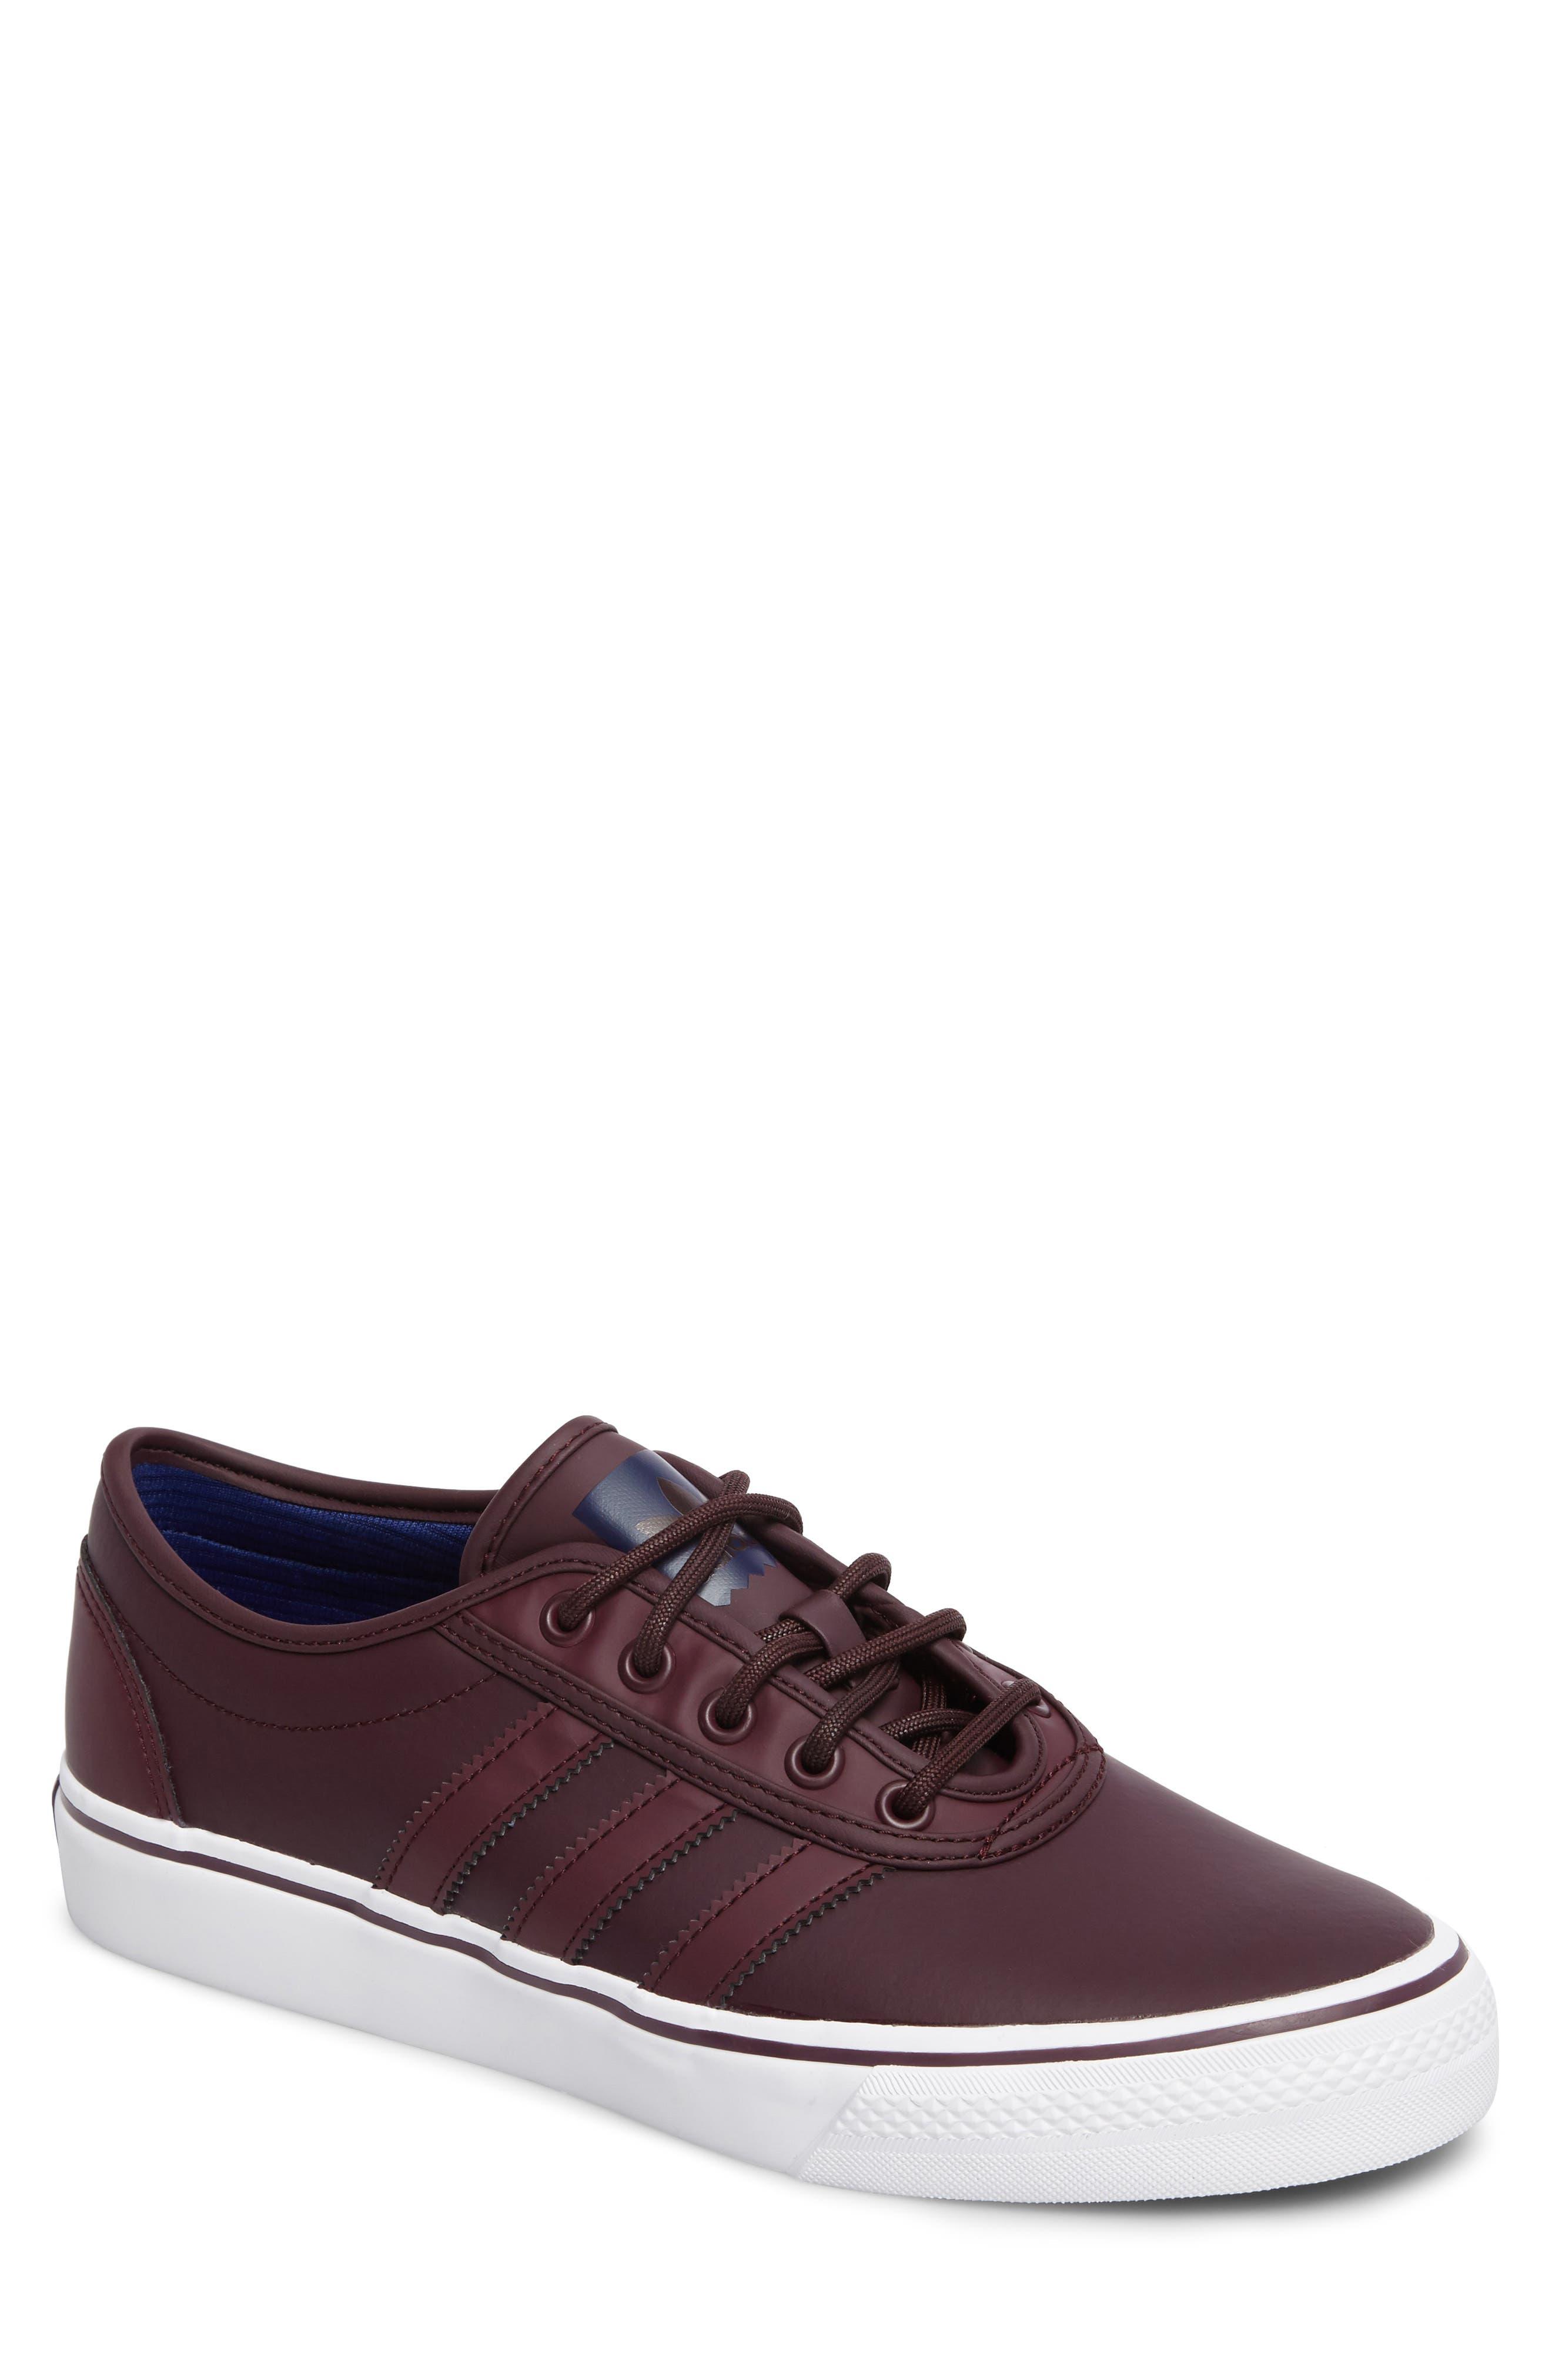 adidas AdiEase Skateboarding Sneaker (Men)